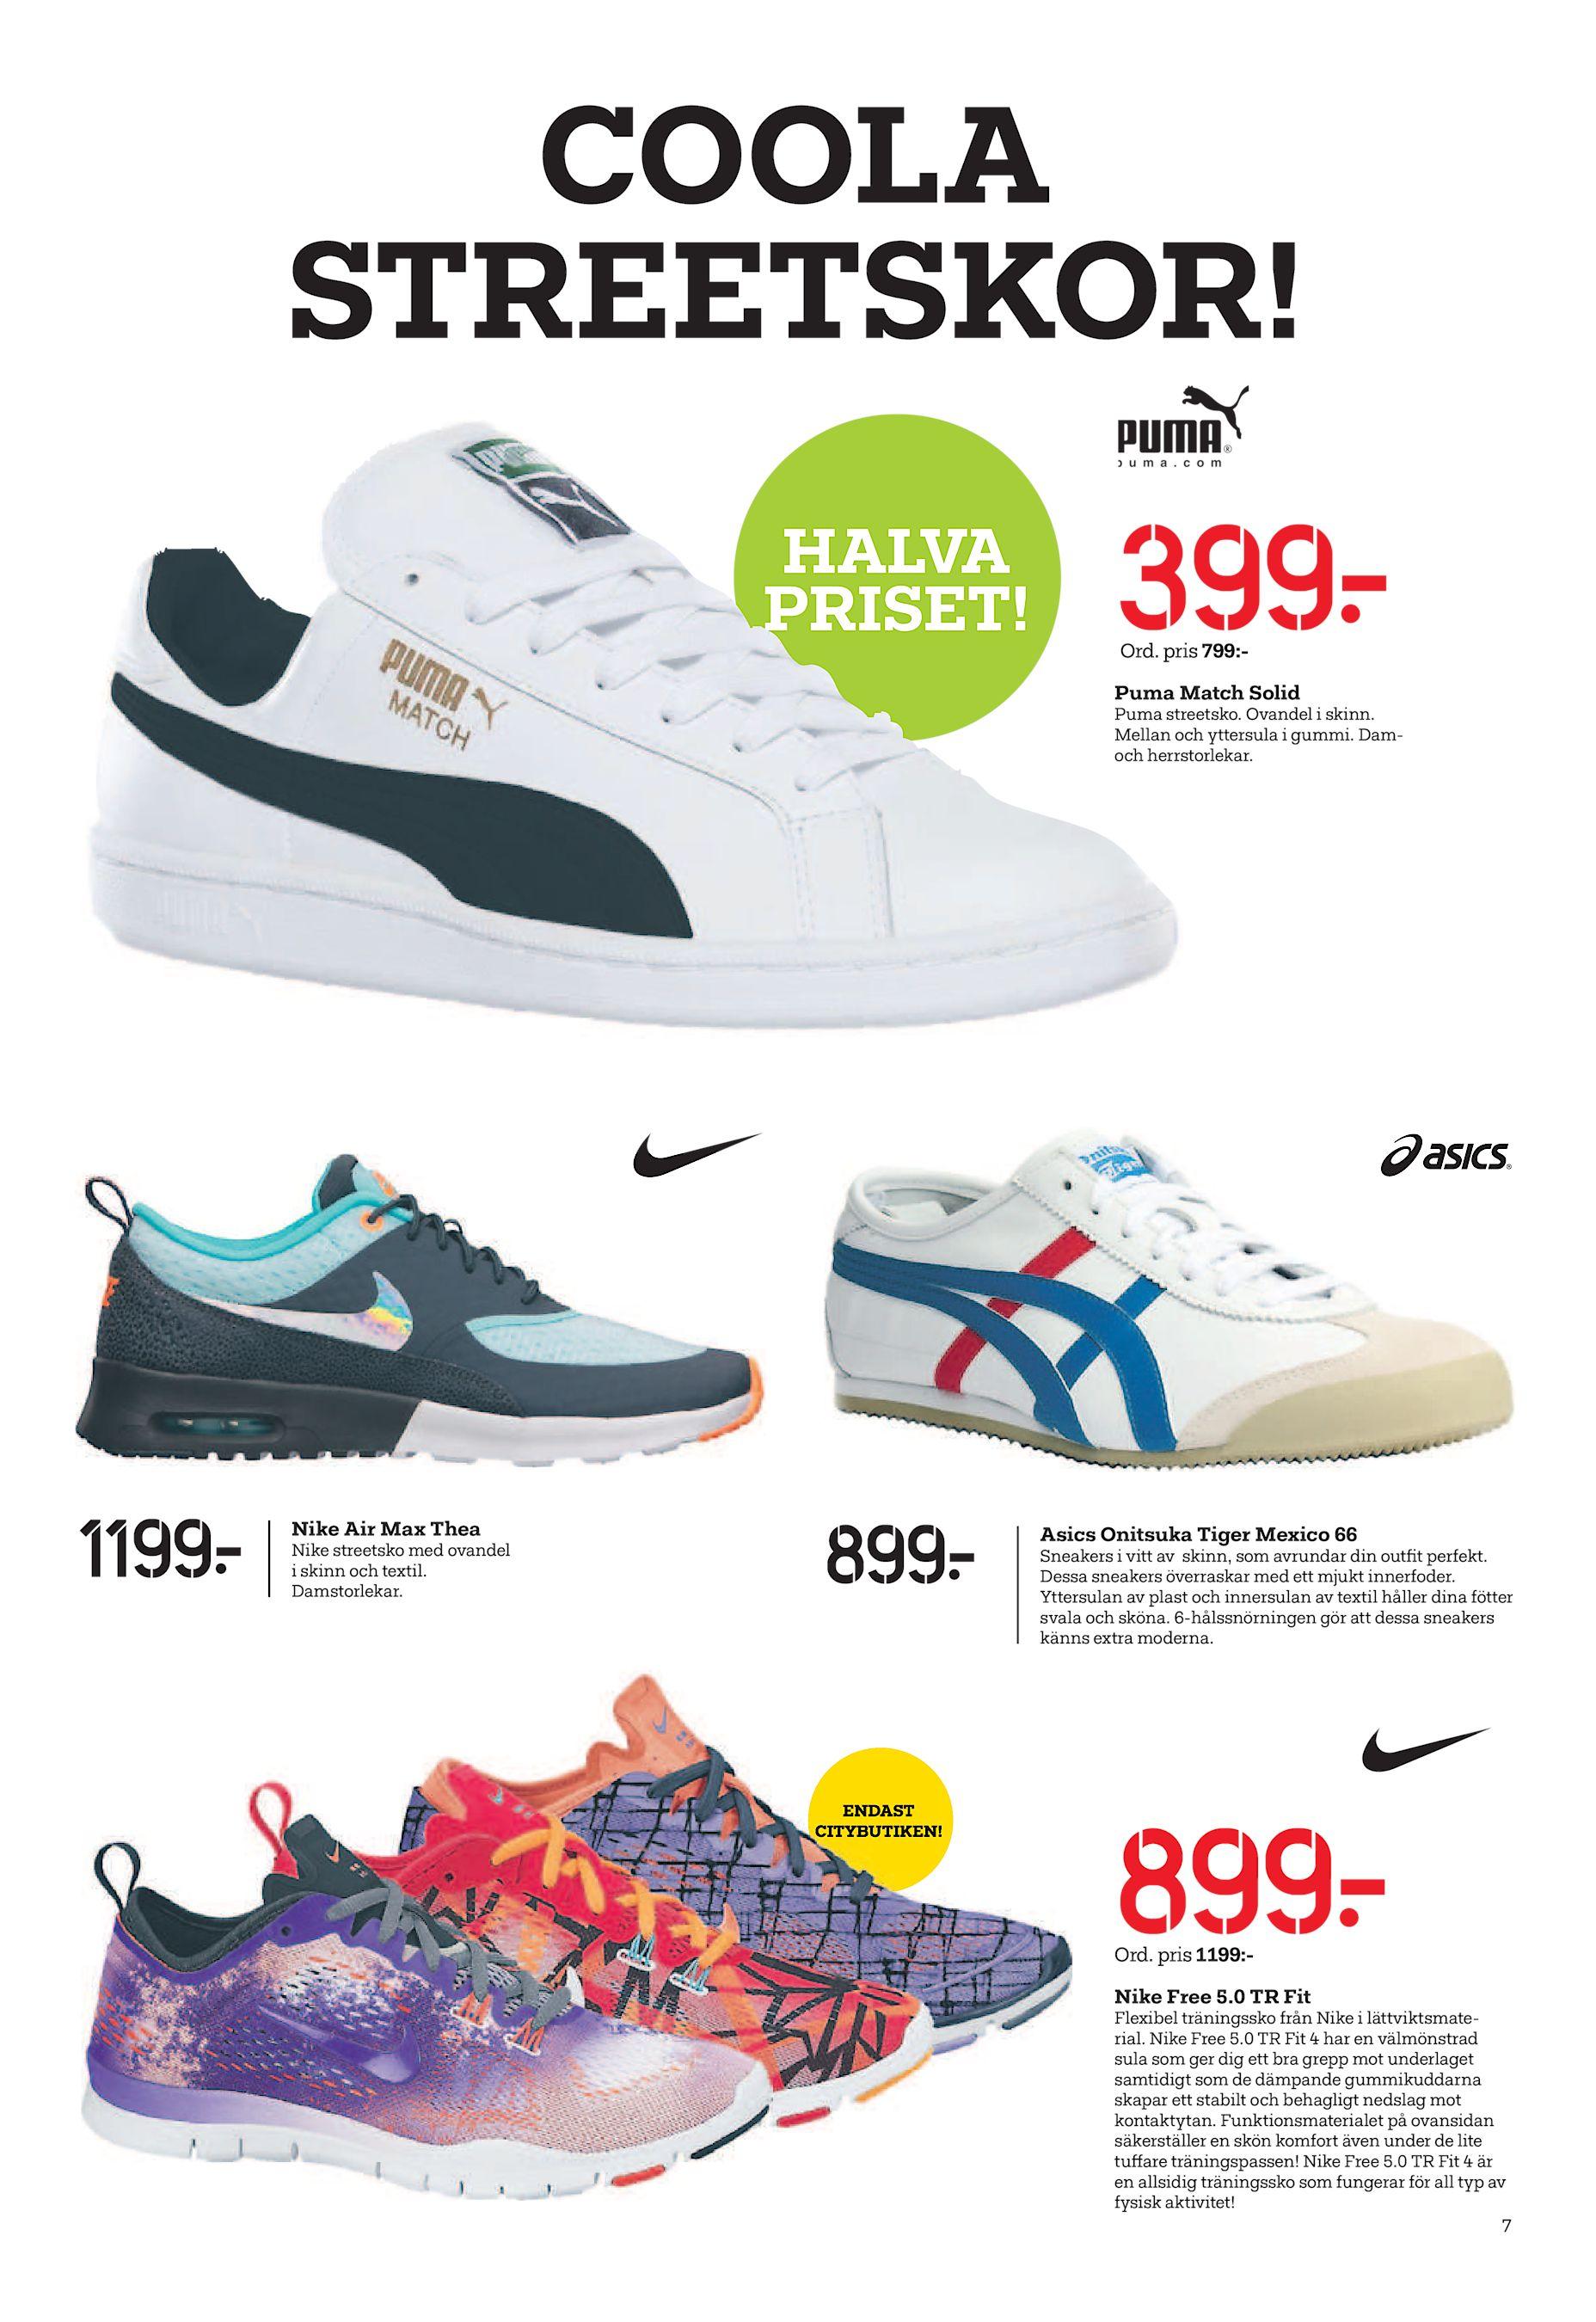 sneakers for cheap a0753 67959 399  Ord. pris 799 Puma Match Solid Puma streetsko. Ovandel i skinn. Mellan  och yttersula i gummi. Damoch herrstorlekar. 1199  Nike Air Max Thea Nike  ...